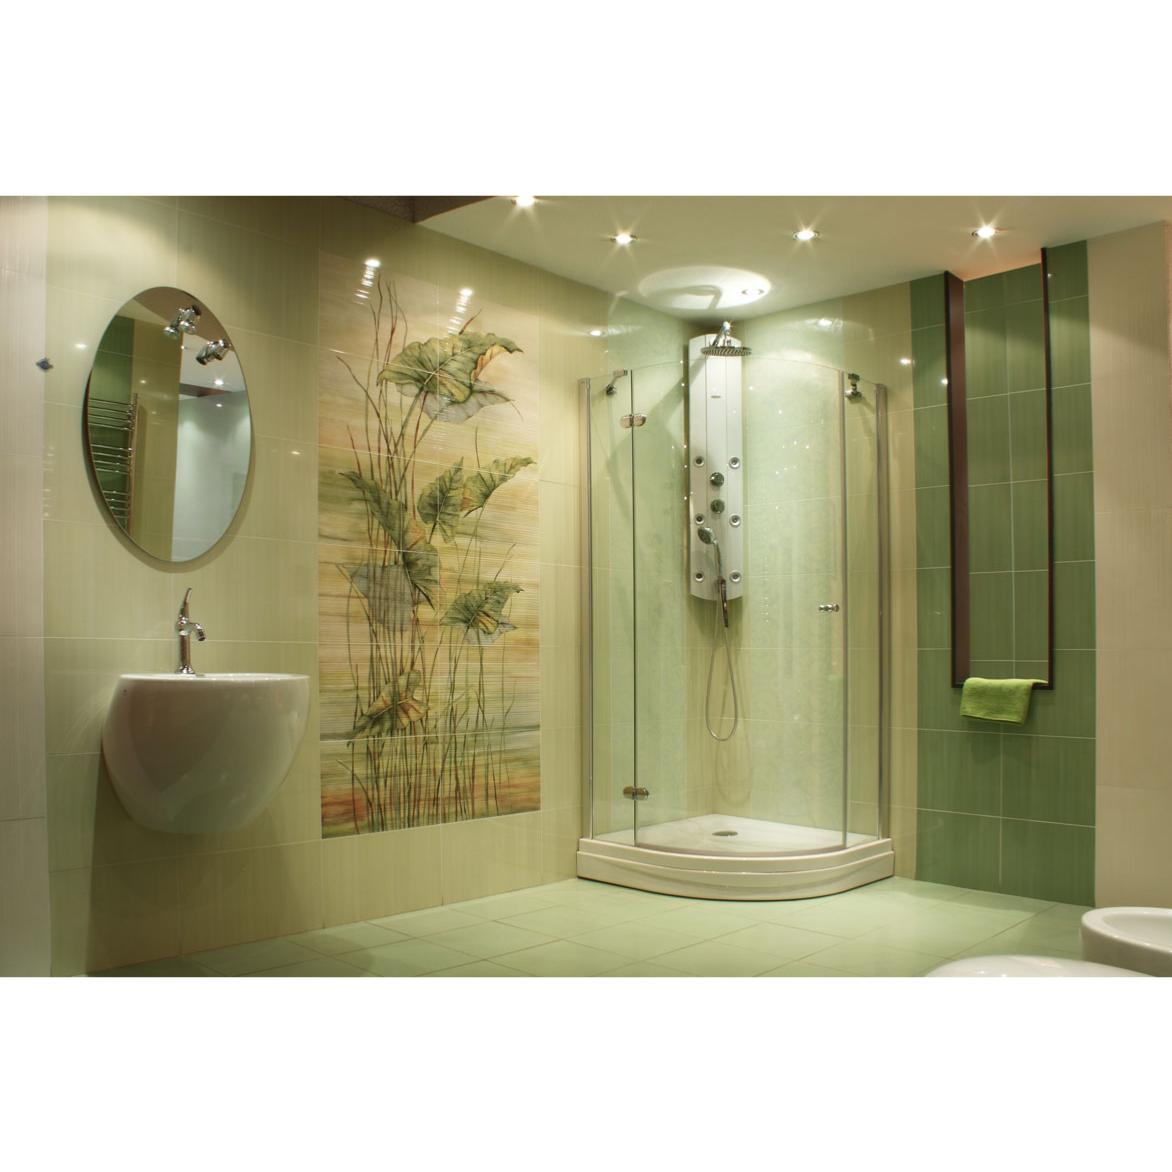 Spot salle de bain encastrable luminaire salle de bain - Spot salle de bain avec interrupteur ...